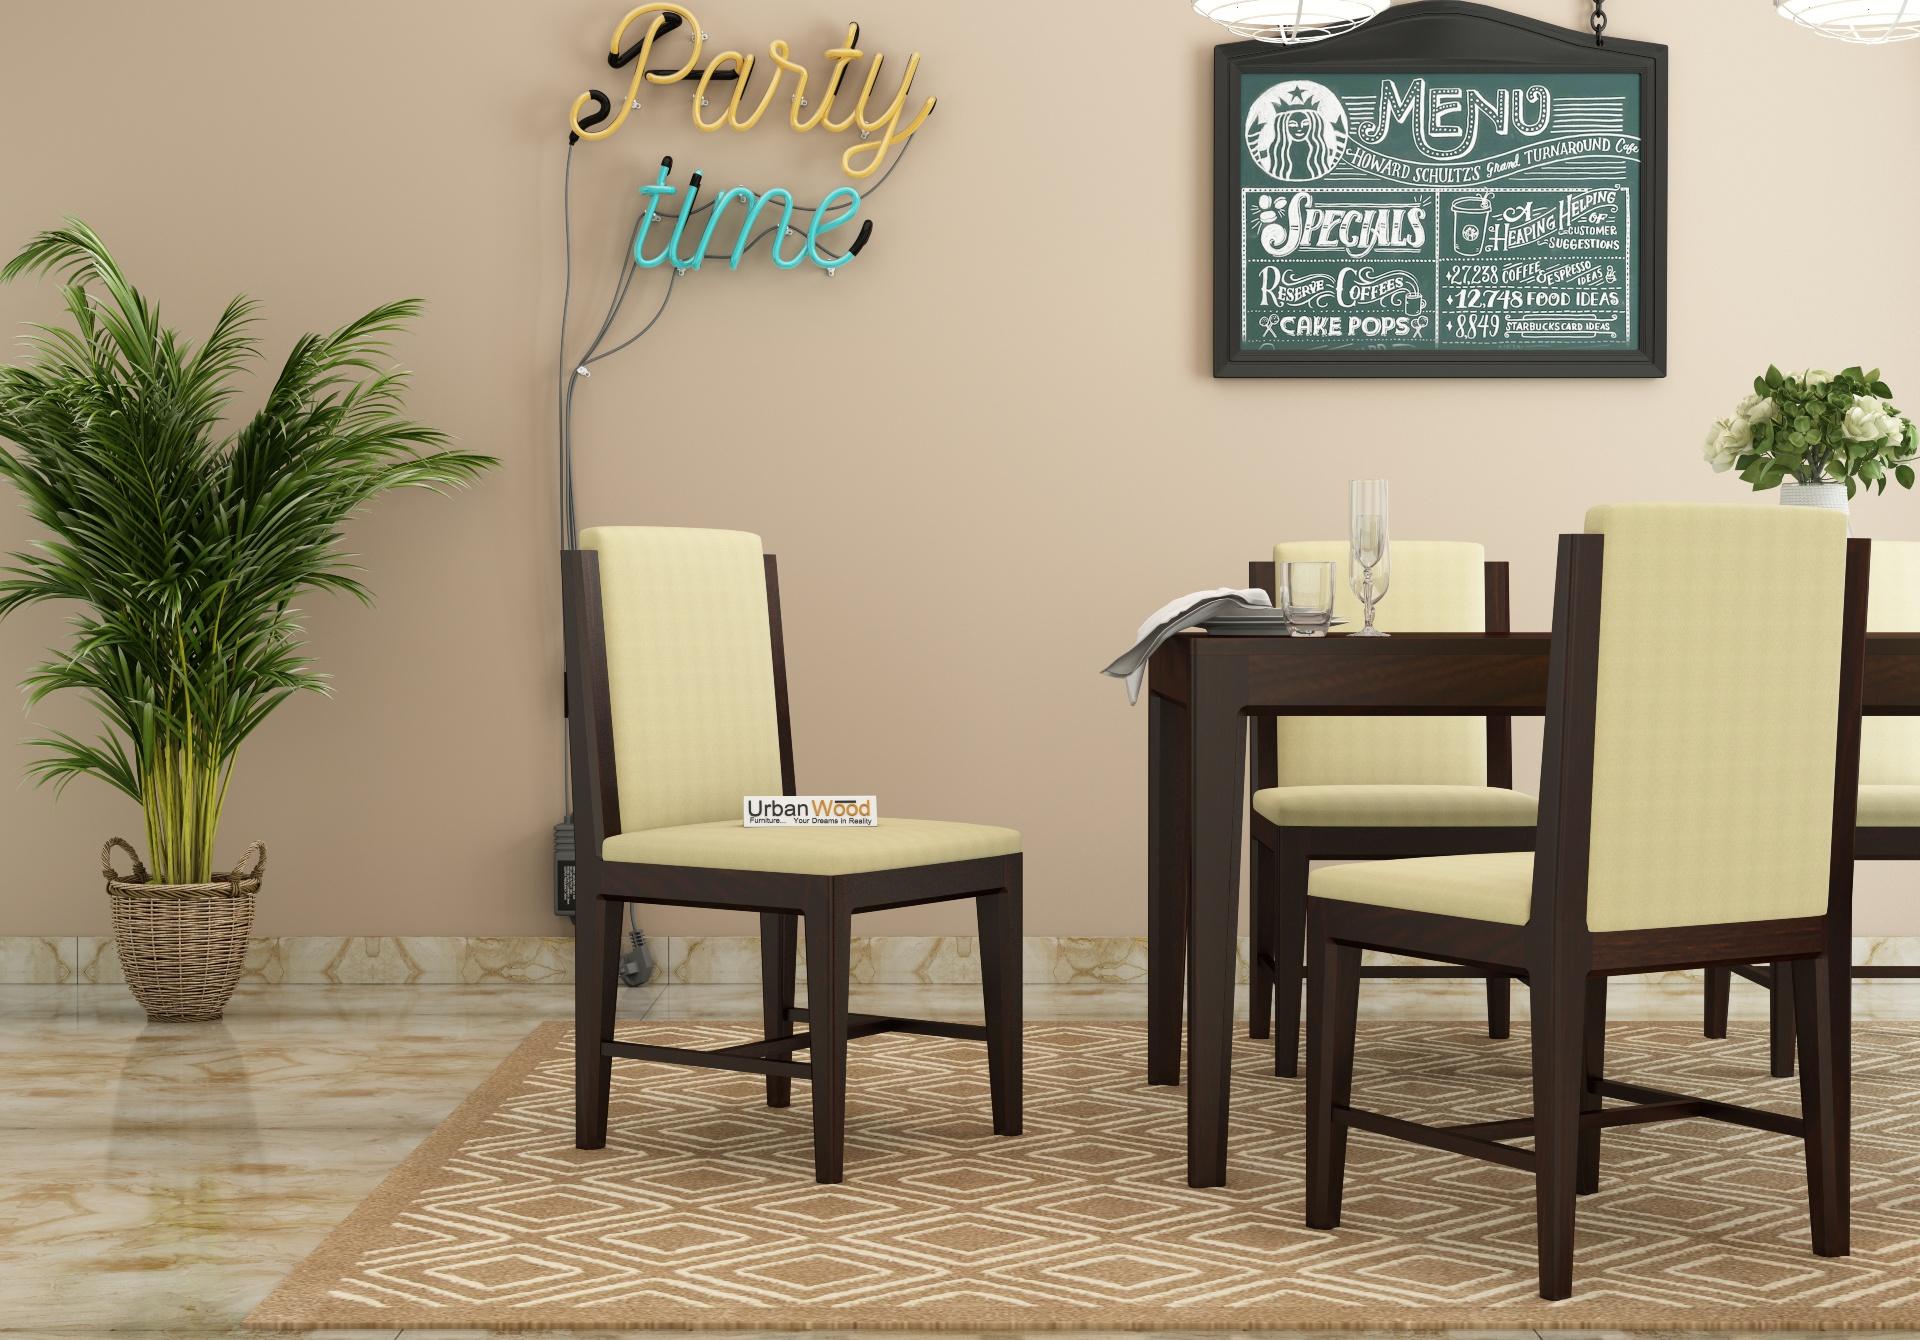 Deck Dining chair <small>( walnut Finish )</small>